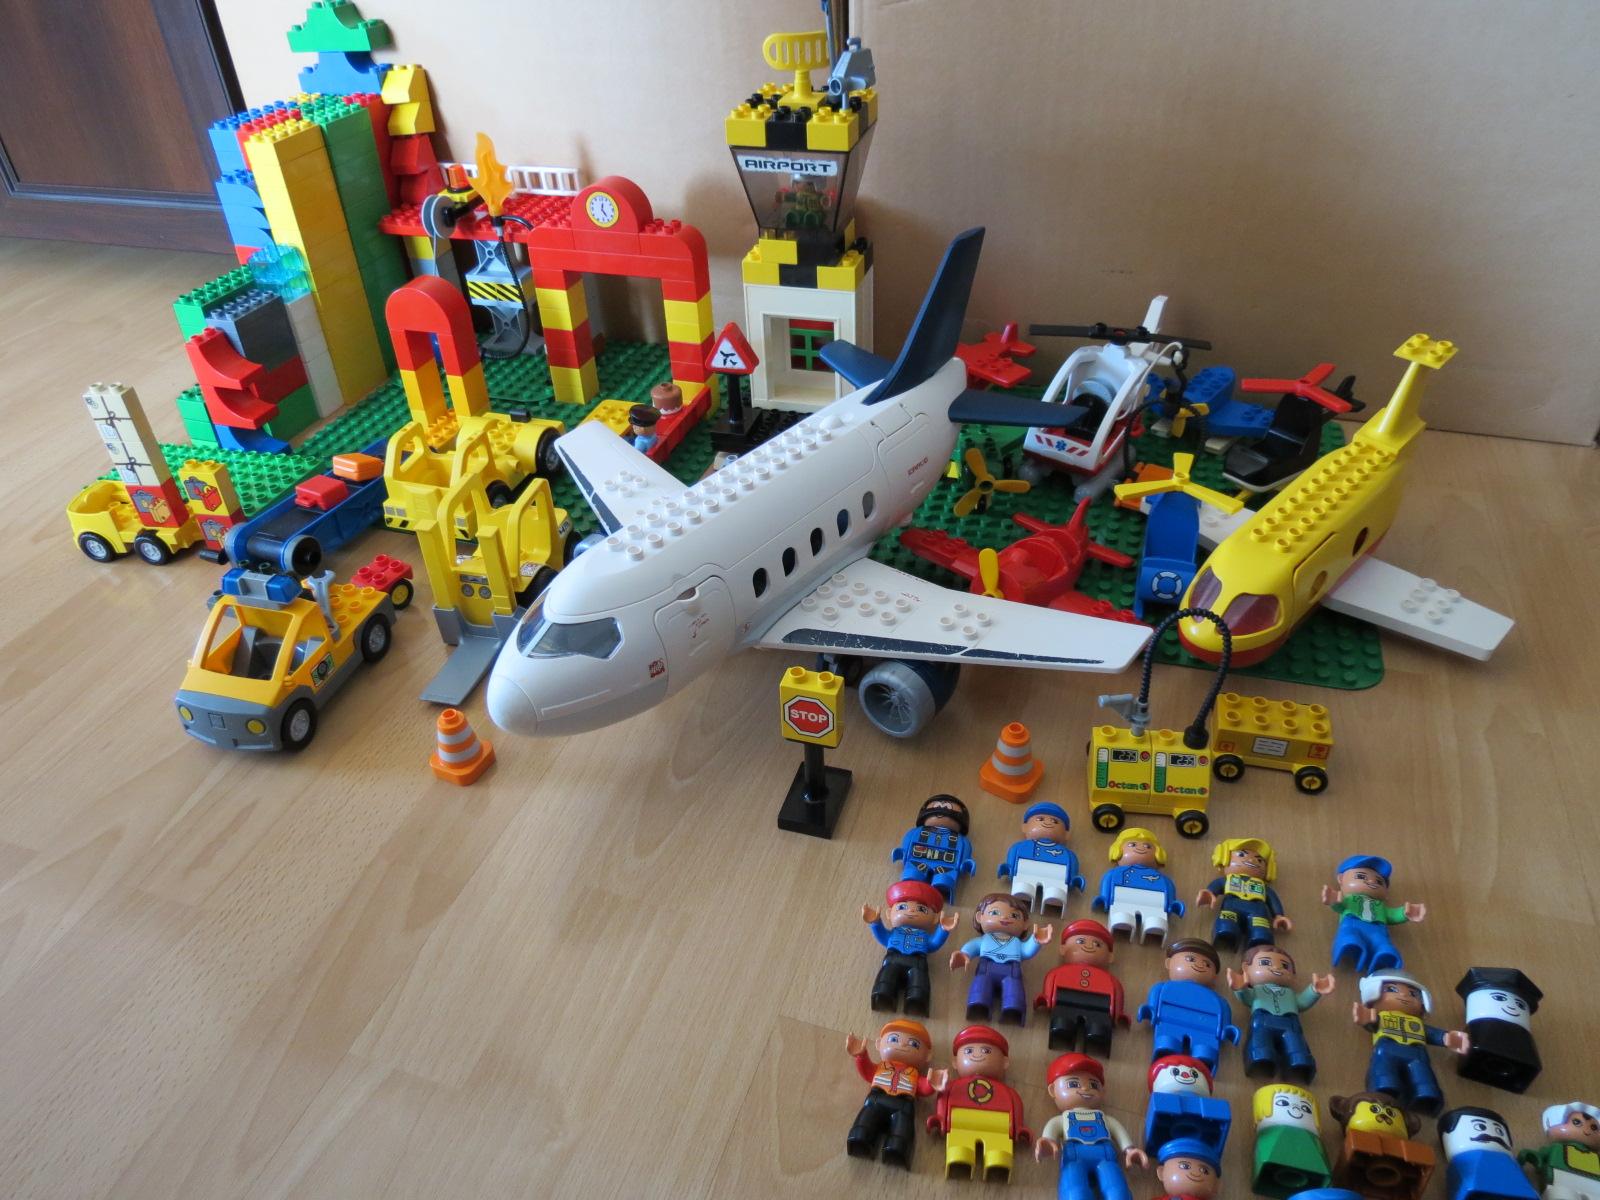 Lego Duplo Lotnisko 6 Kg Ok 408 Elem L286 7292410259